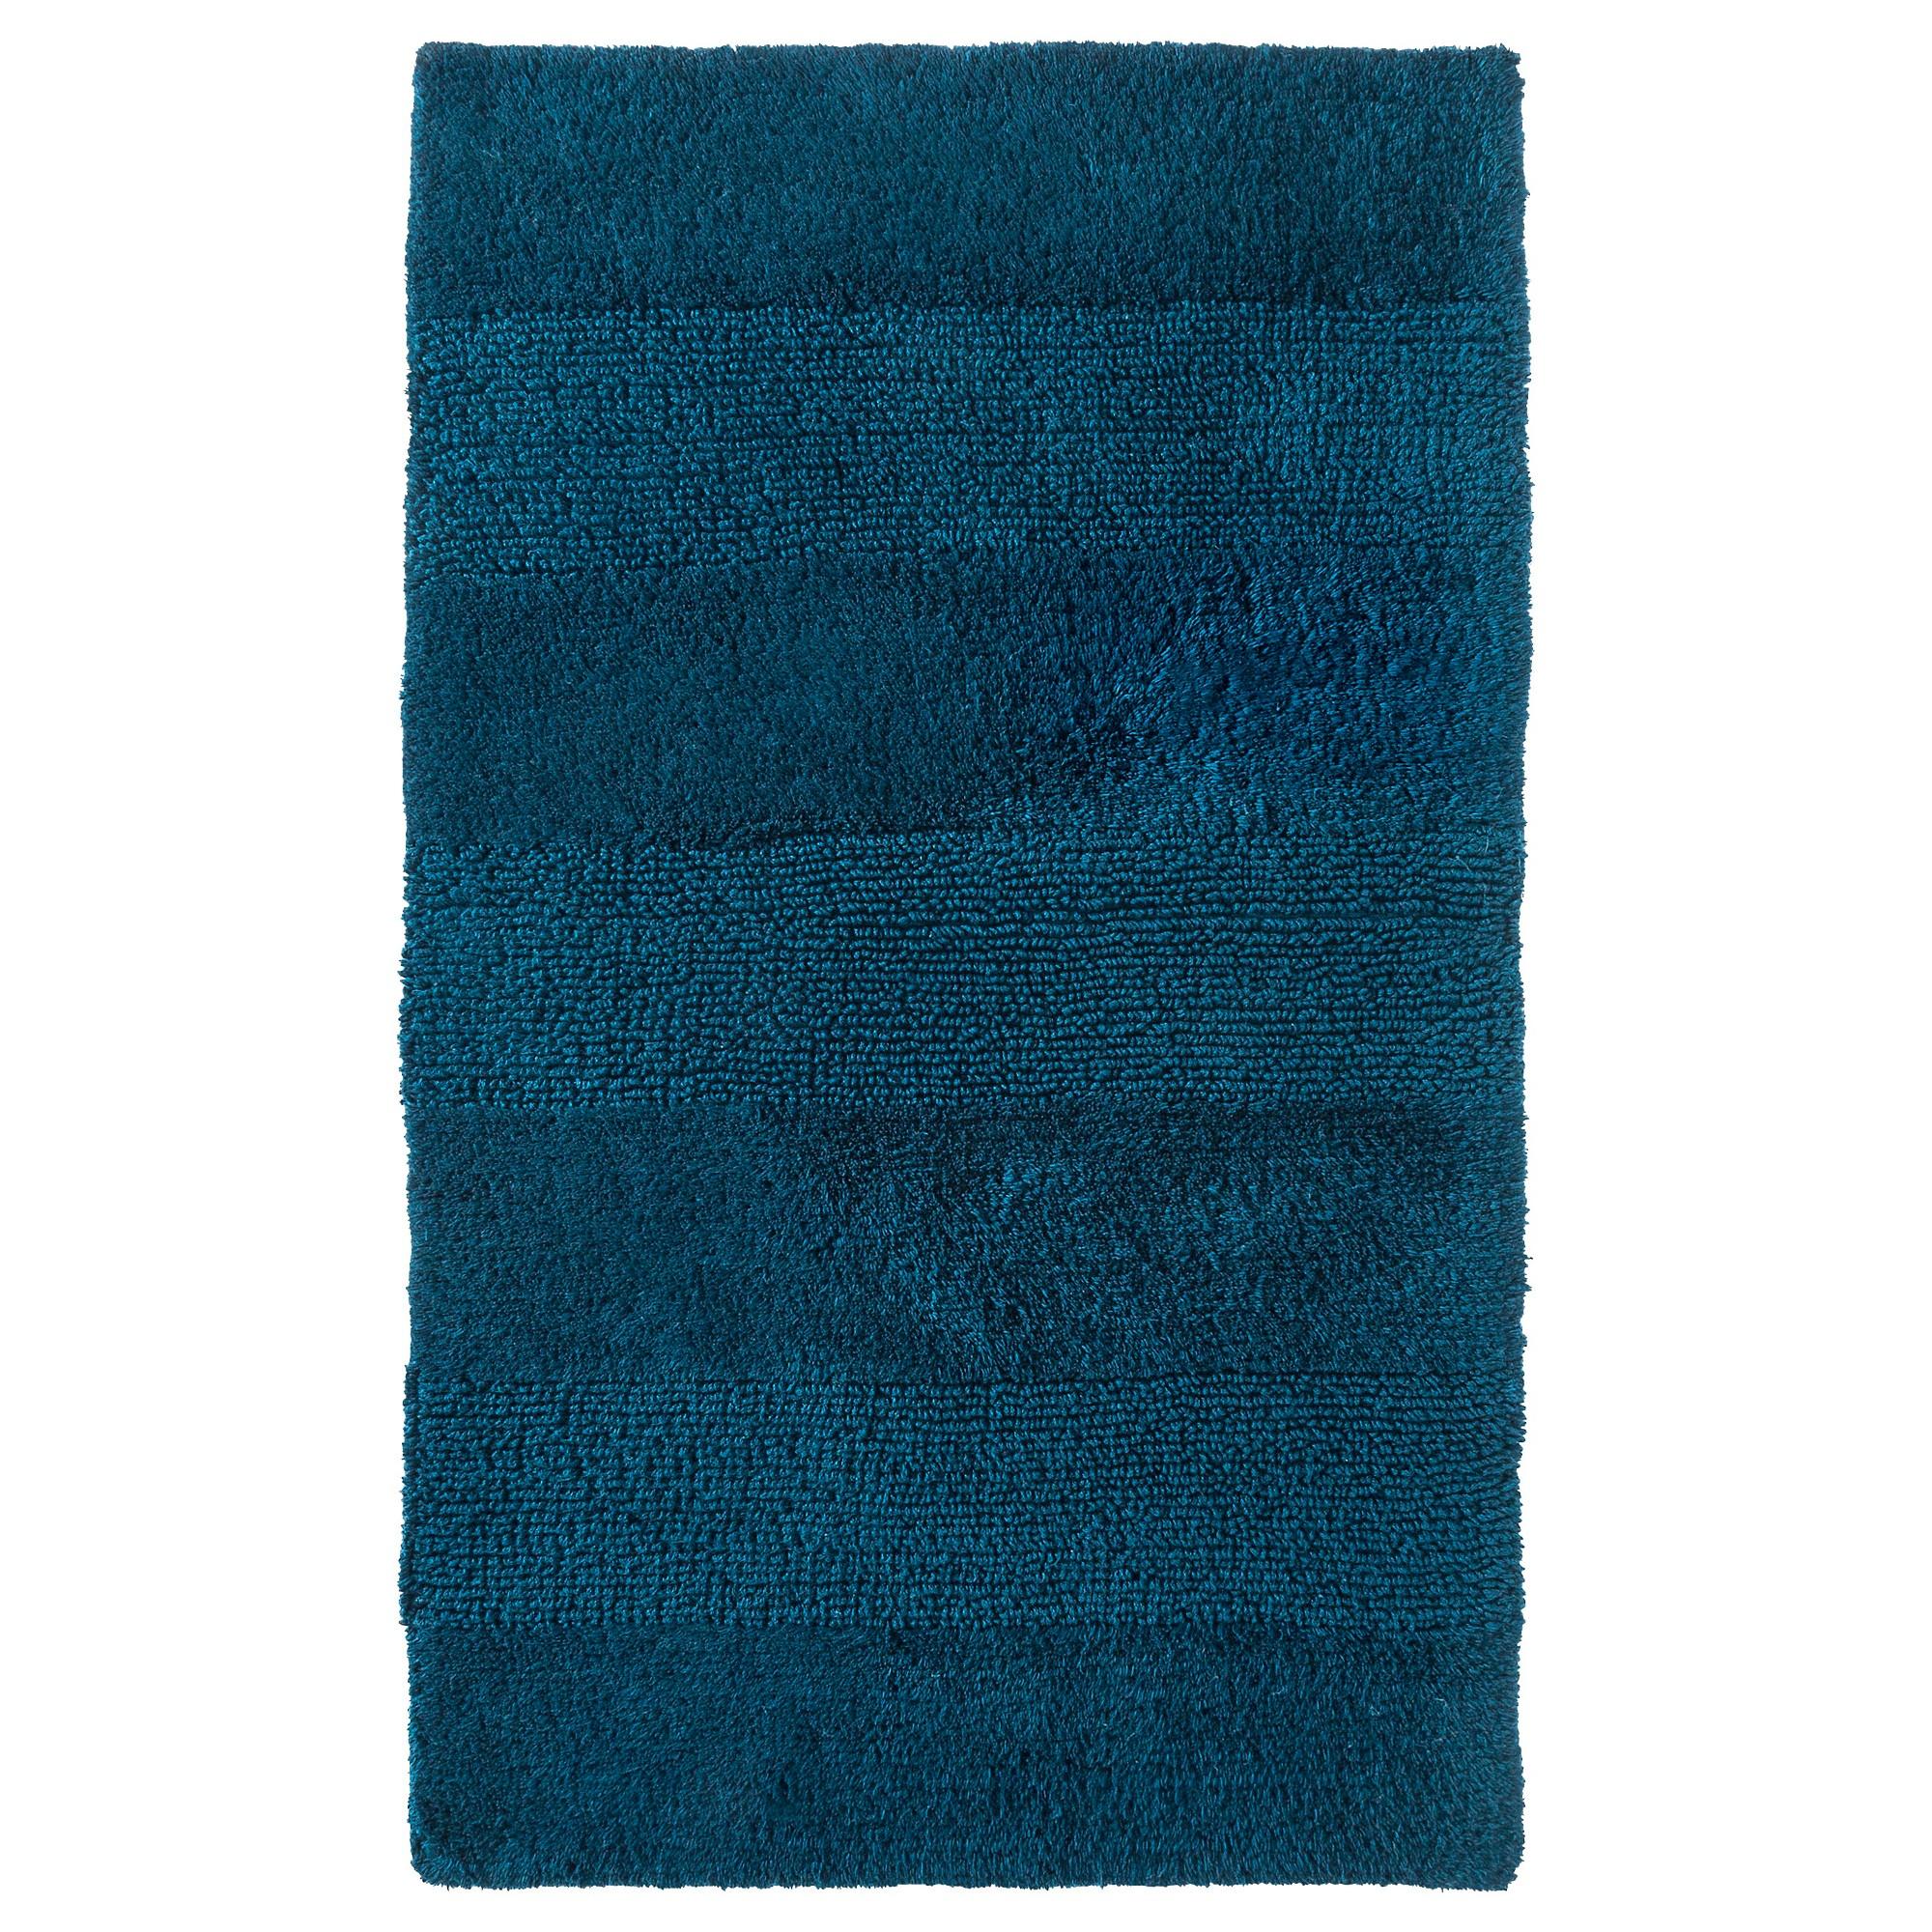 Tonal Stripe Bath Rug Siam Blue (24x38) - Nate Berkus | Bath rugs ...